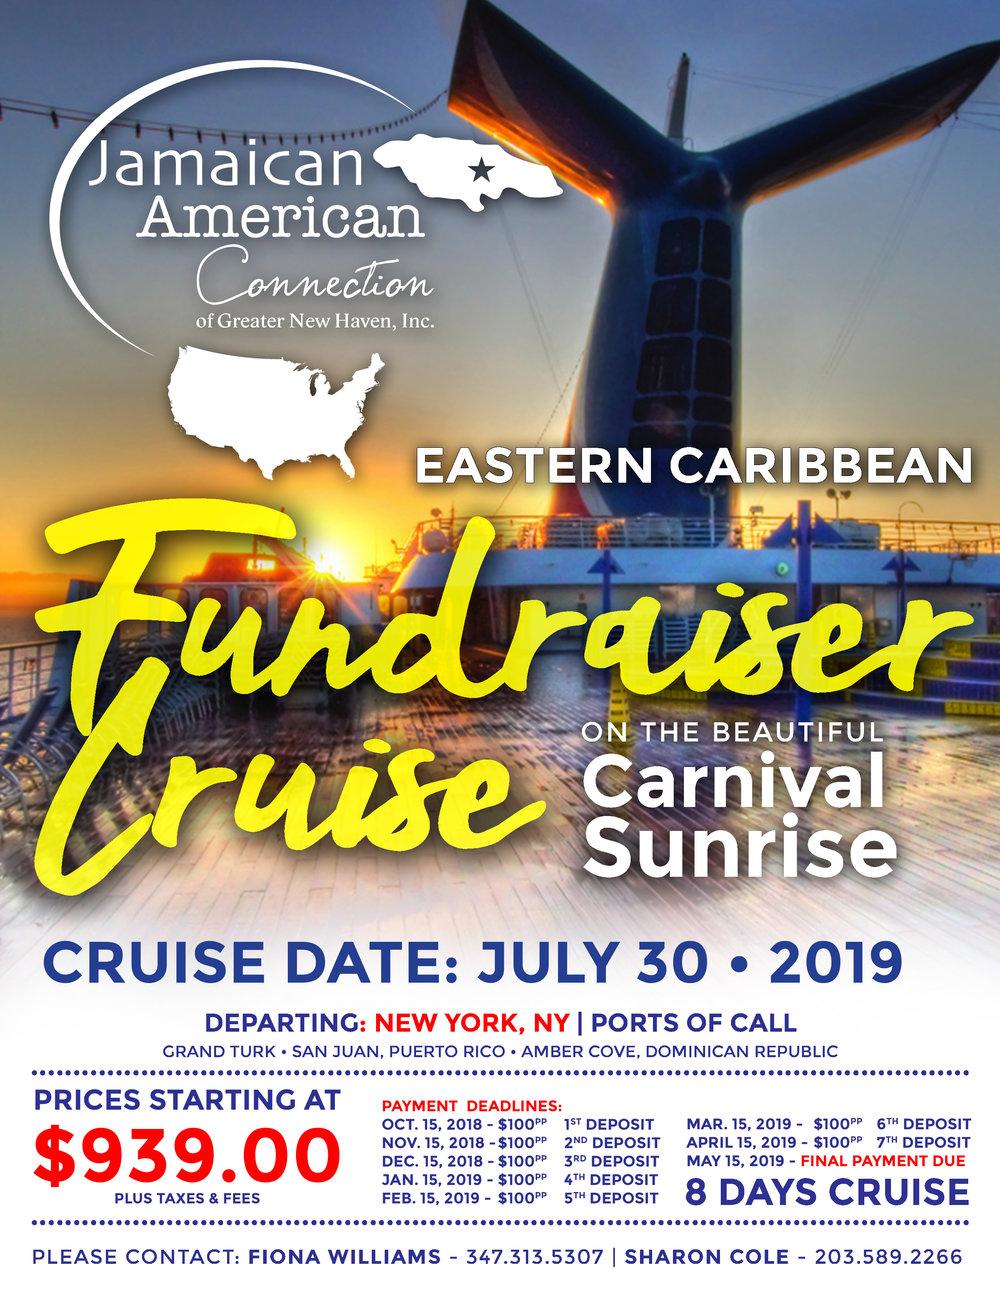 JAC Cruise 2019 carnival sunrise.jpg